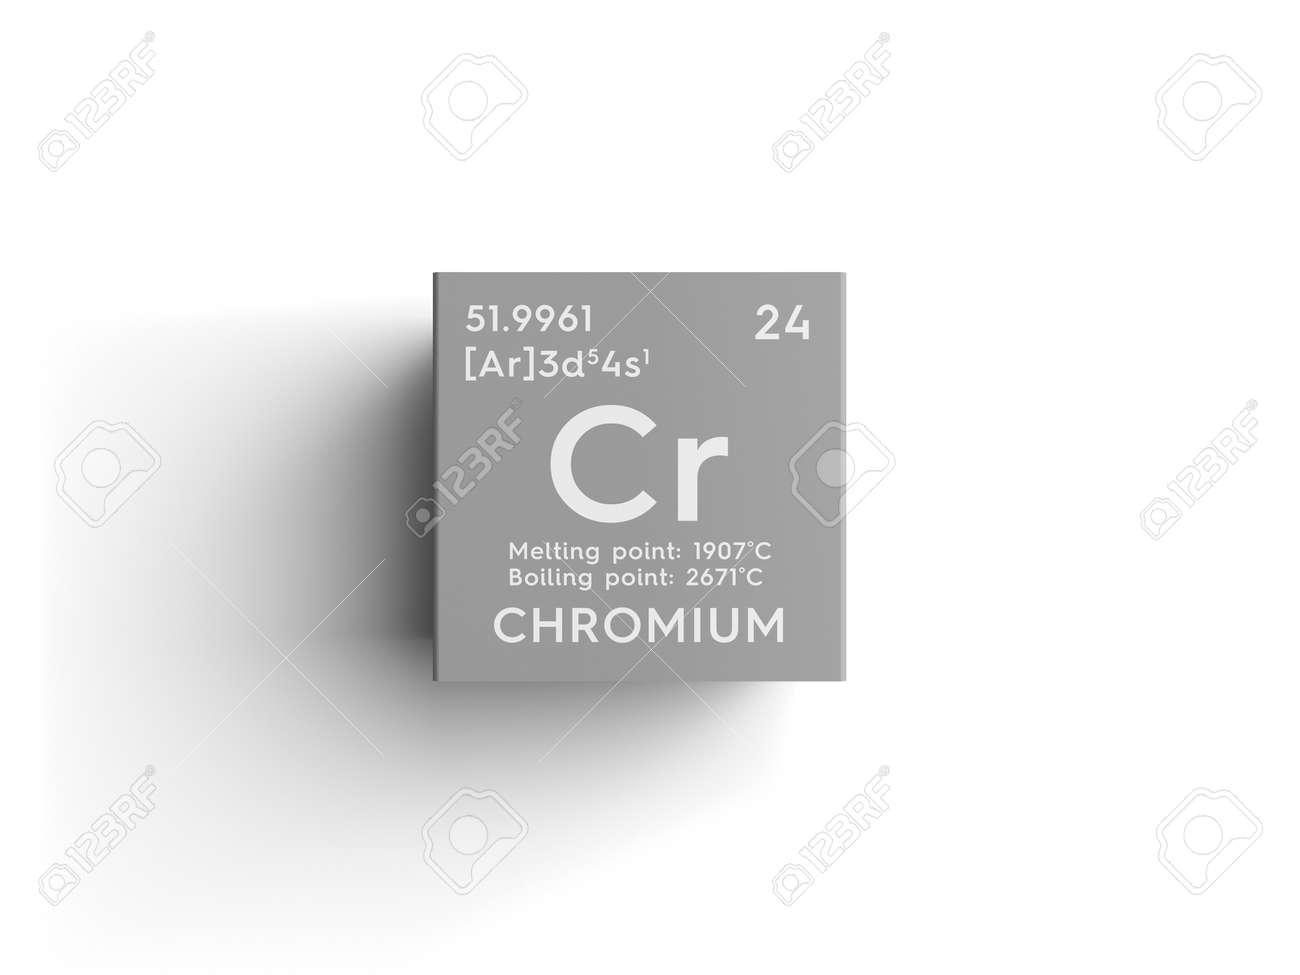 Chromium Transition Metals Chemical Element Of Mendeleevs Stock